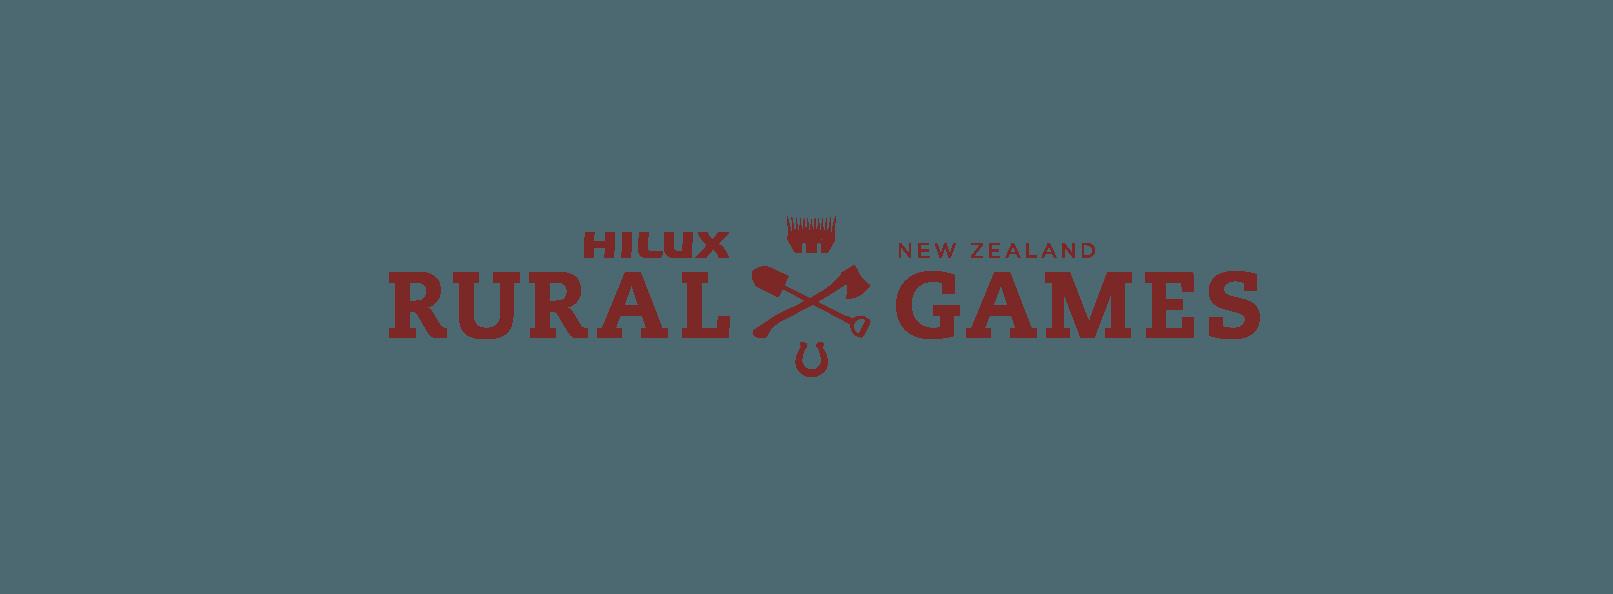 Hilux NZ Rural Games logo